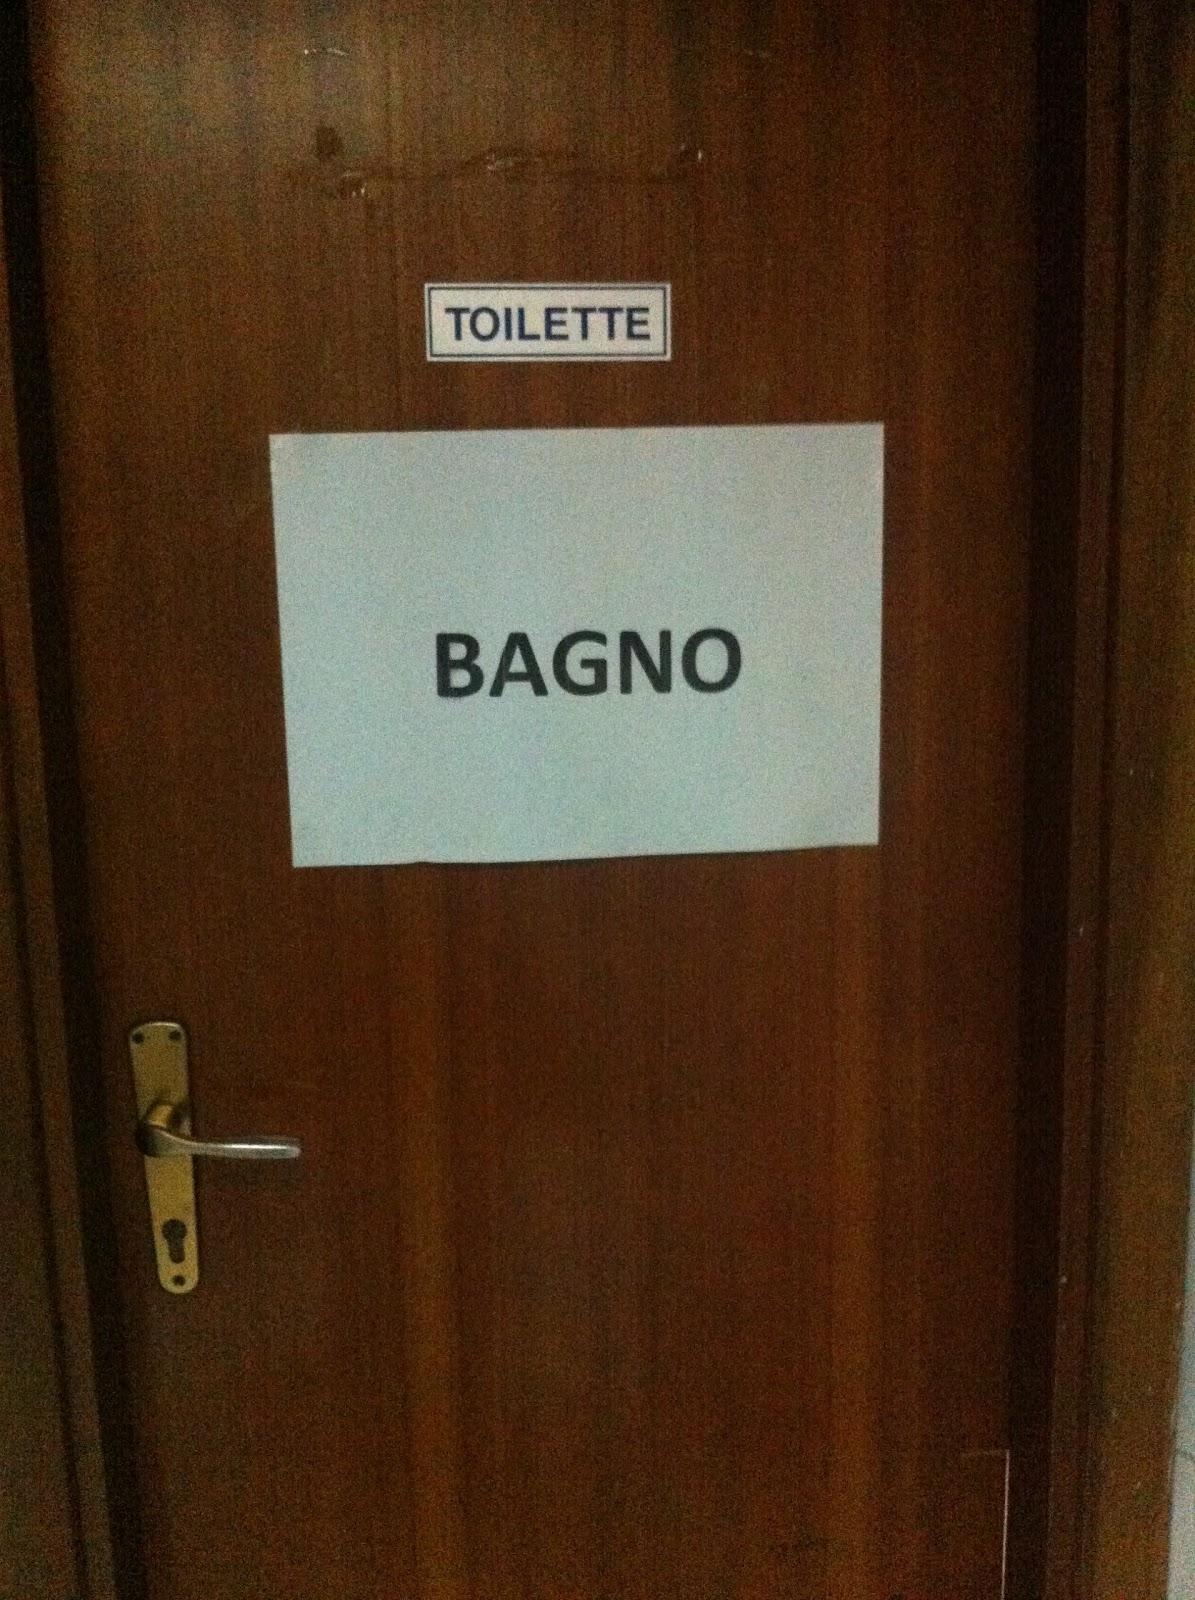 Acabhnews novembre 2012 - Toilette da bagno ...